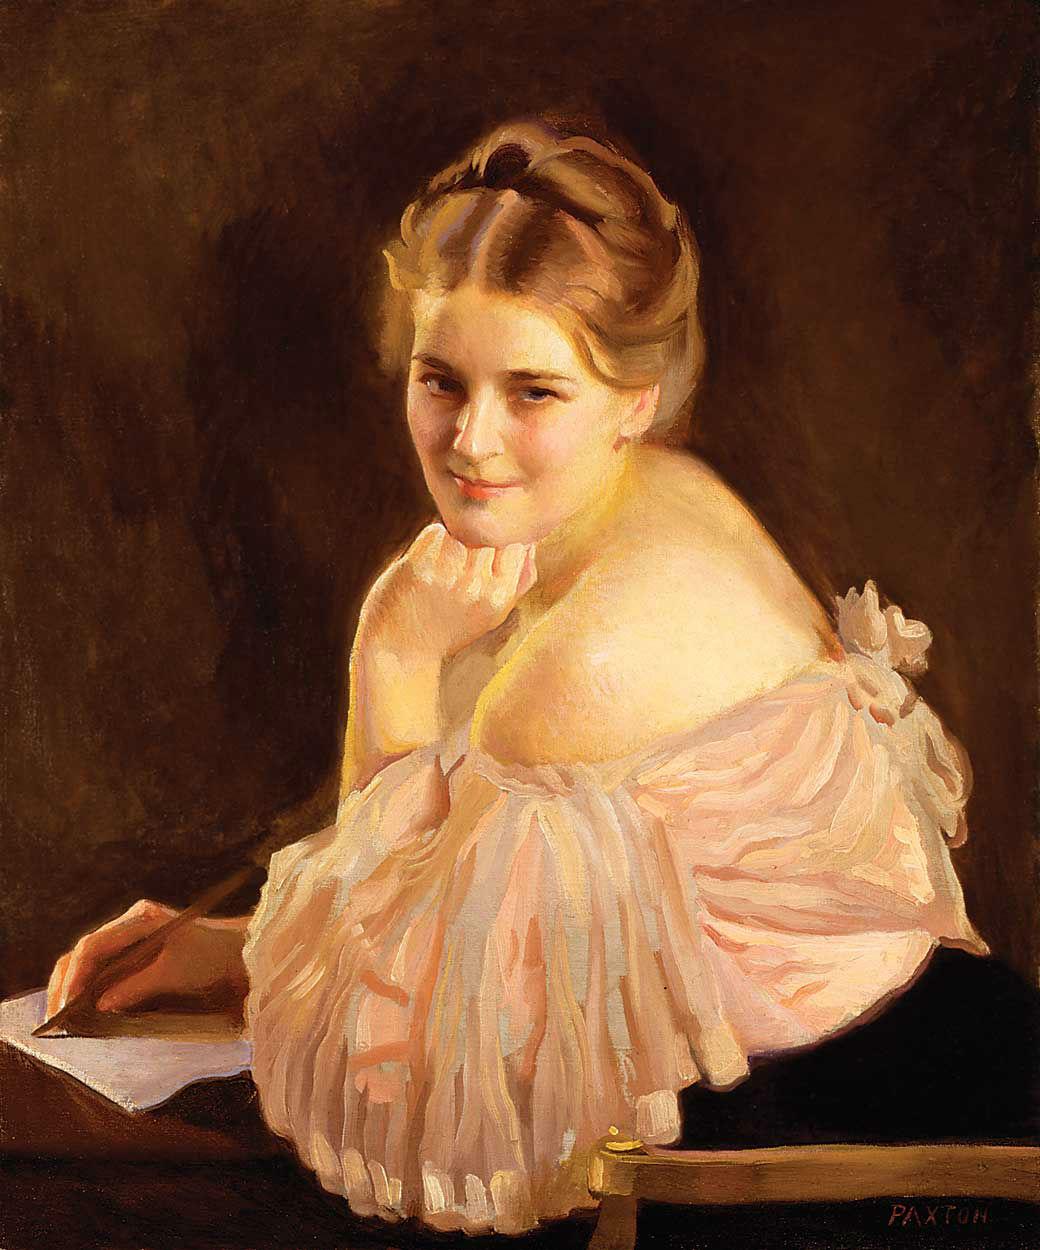 Уильям Пакстон - The Note (Mrs. Ernest Major), 1902